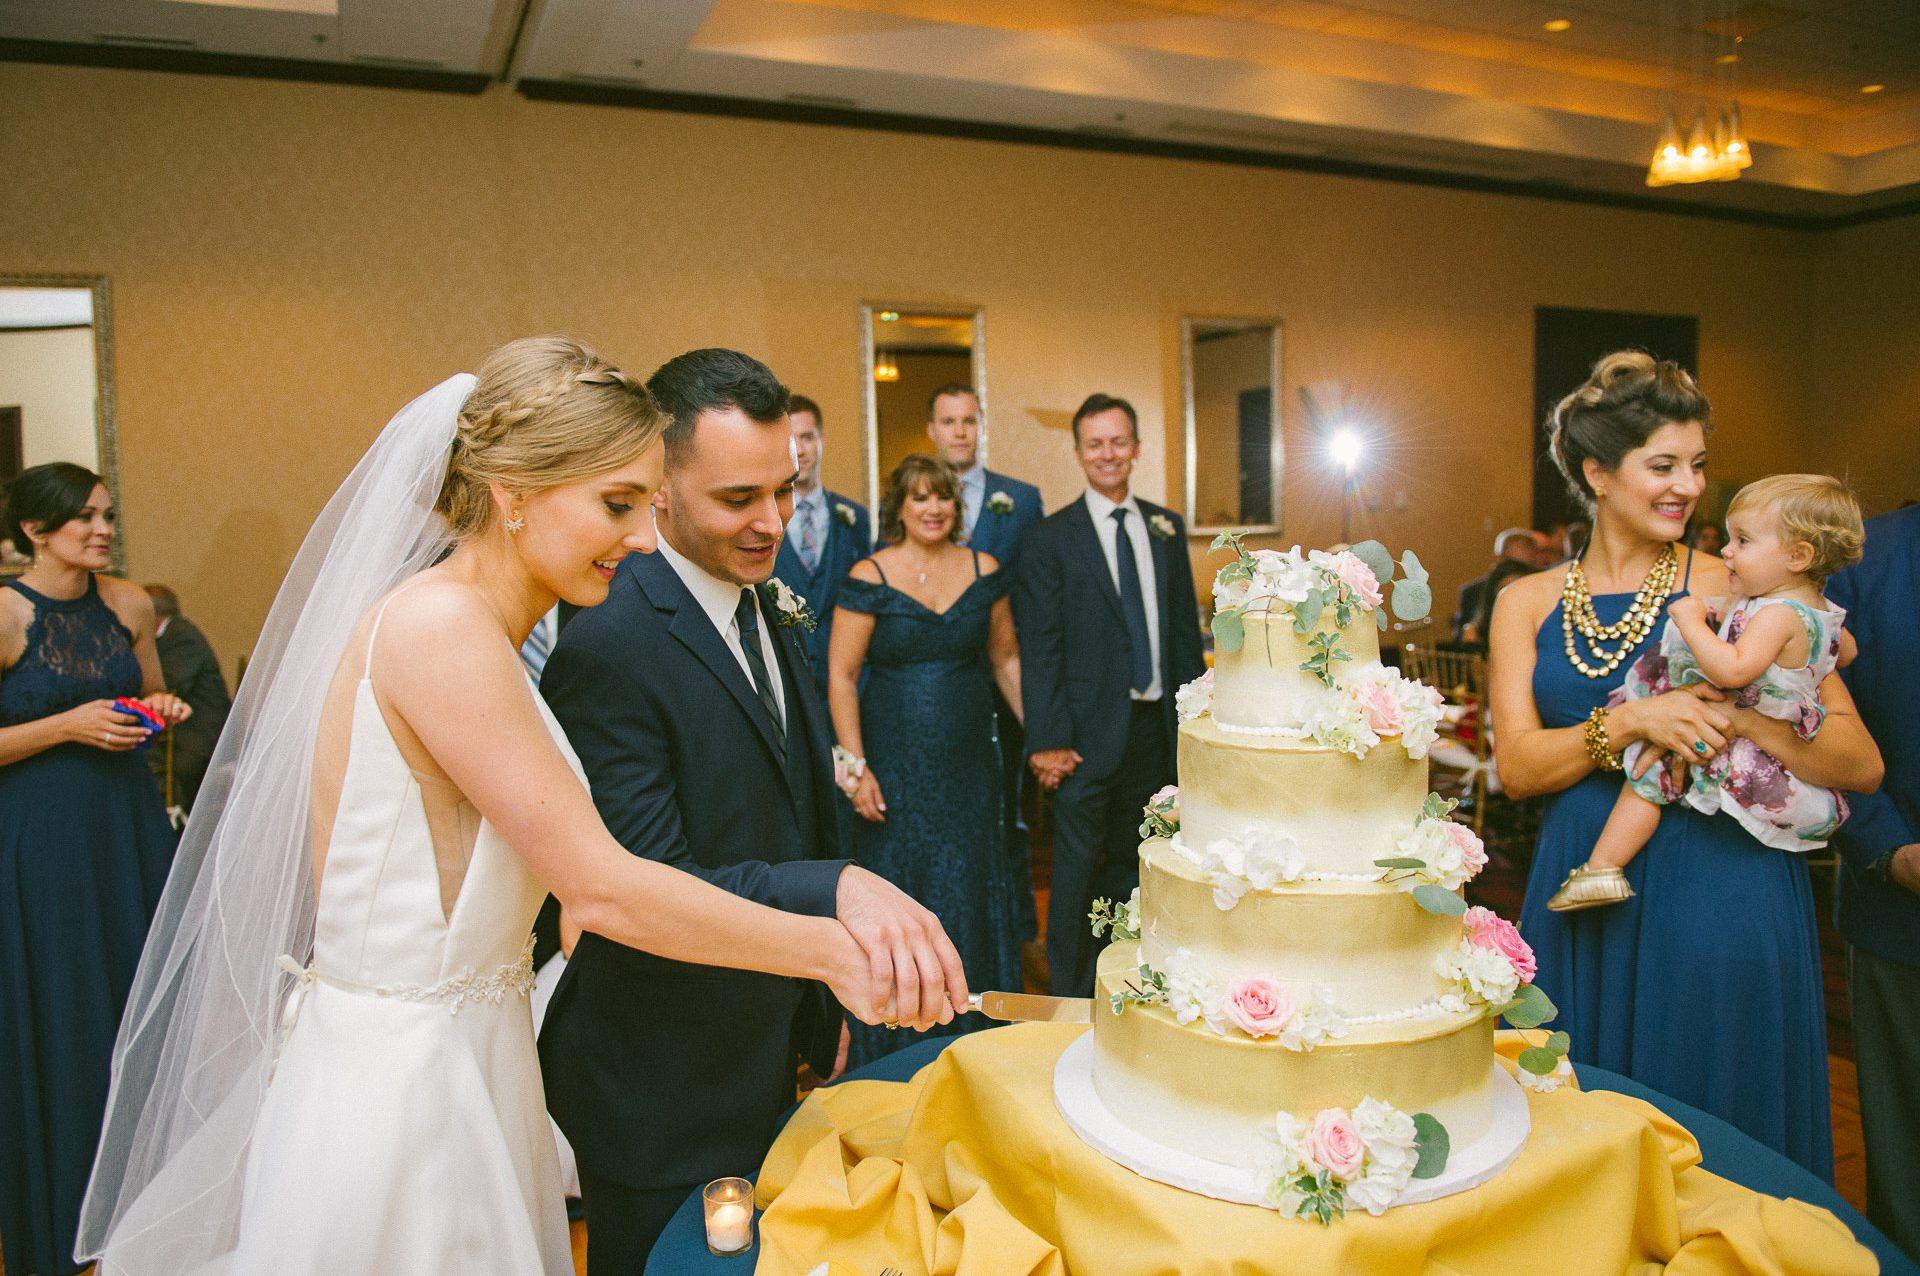 Bertram Inn Wedding Photographer in Aurora 2 17.jpg